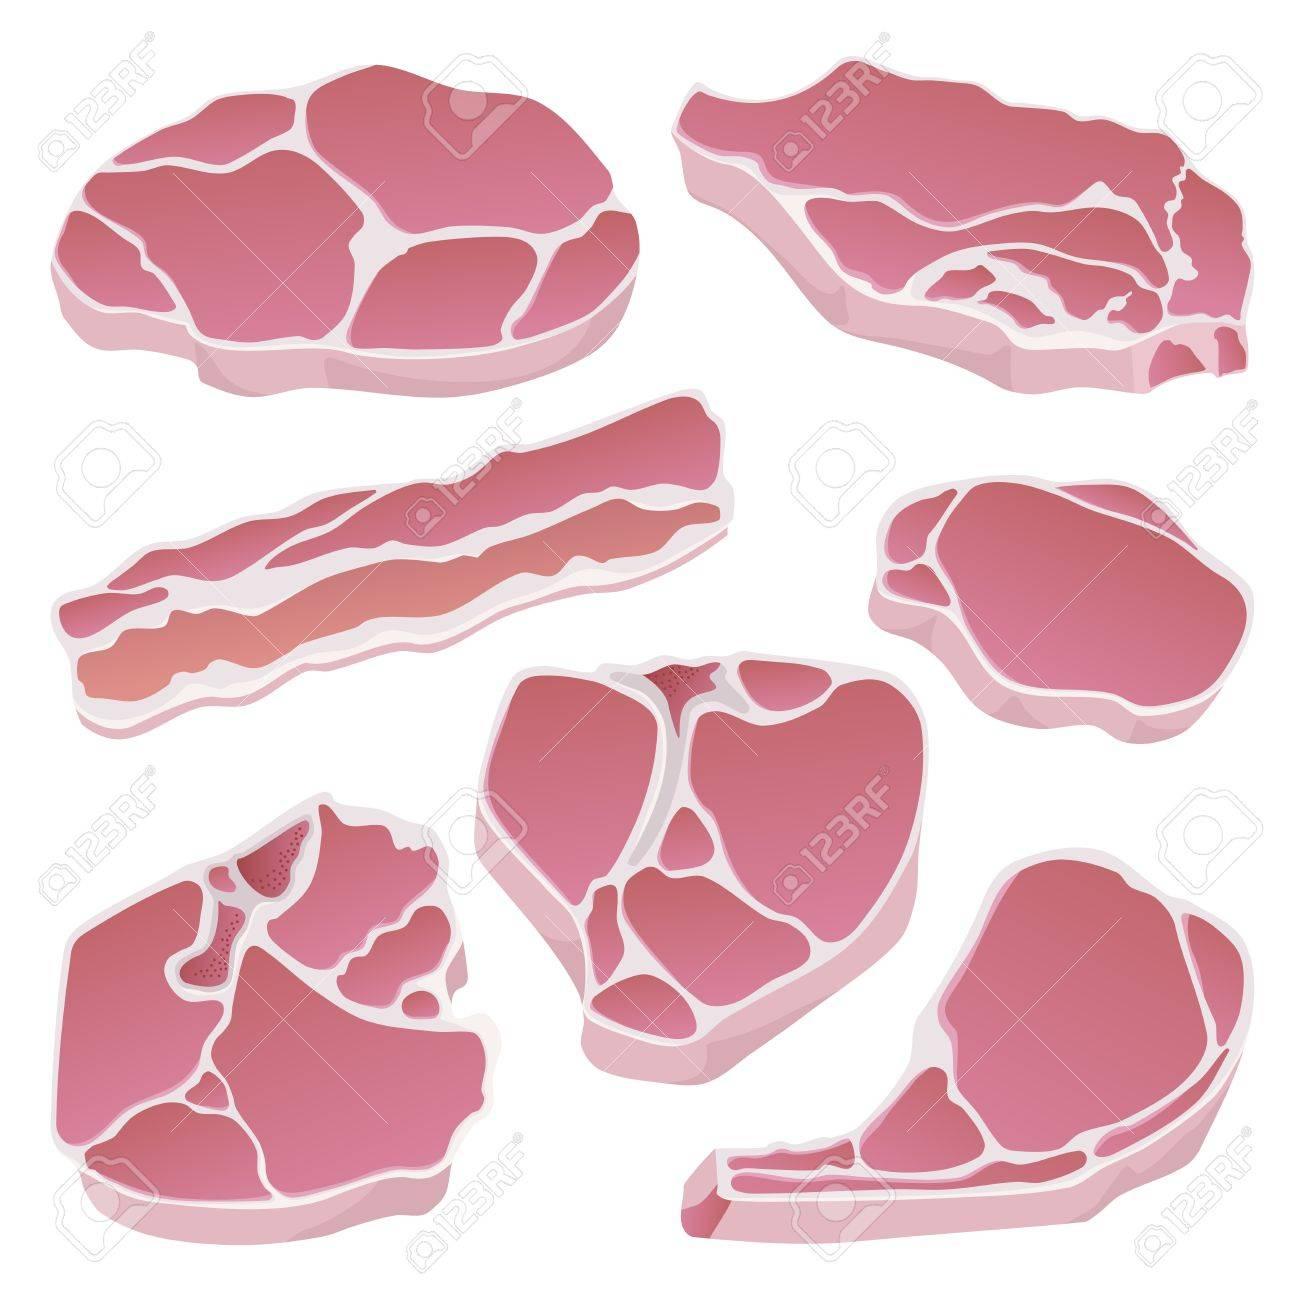 Raw pork cuts isolated - 23298403